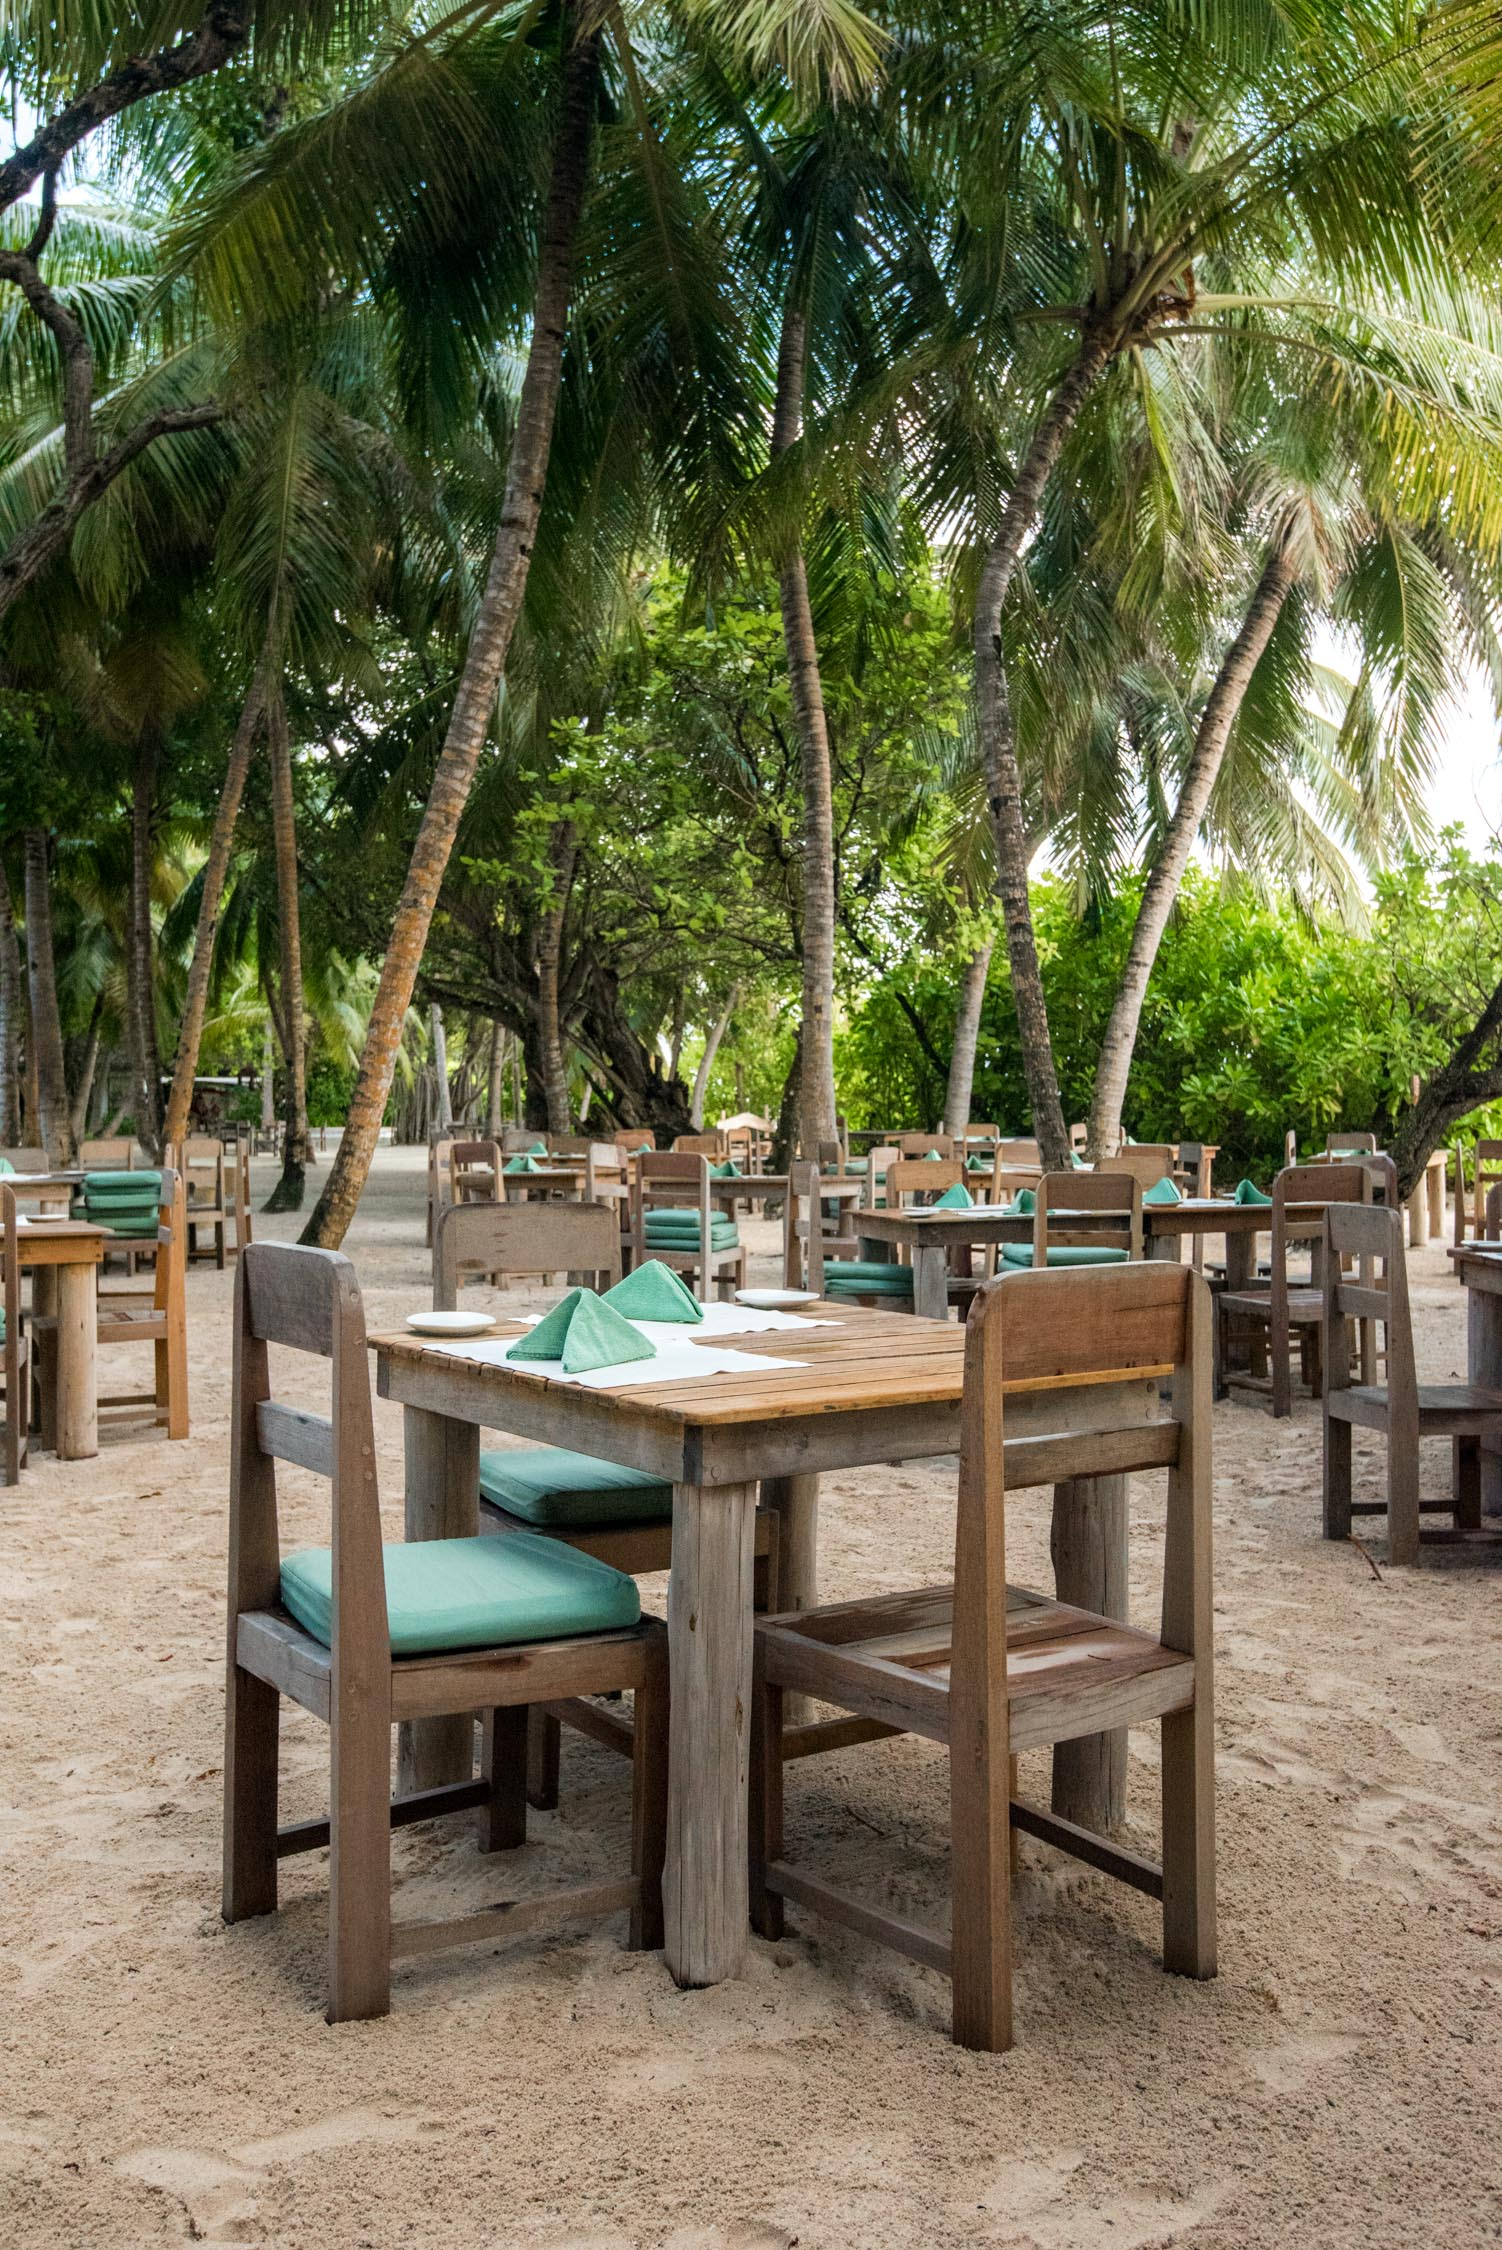 Maldives_Soneva_Fushi-145-20170512.jpg